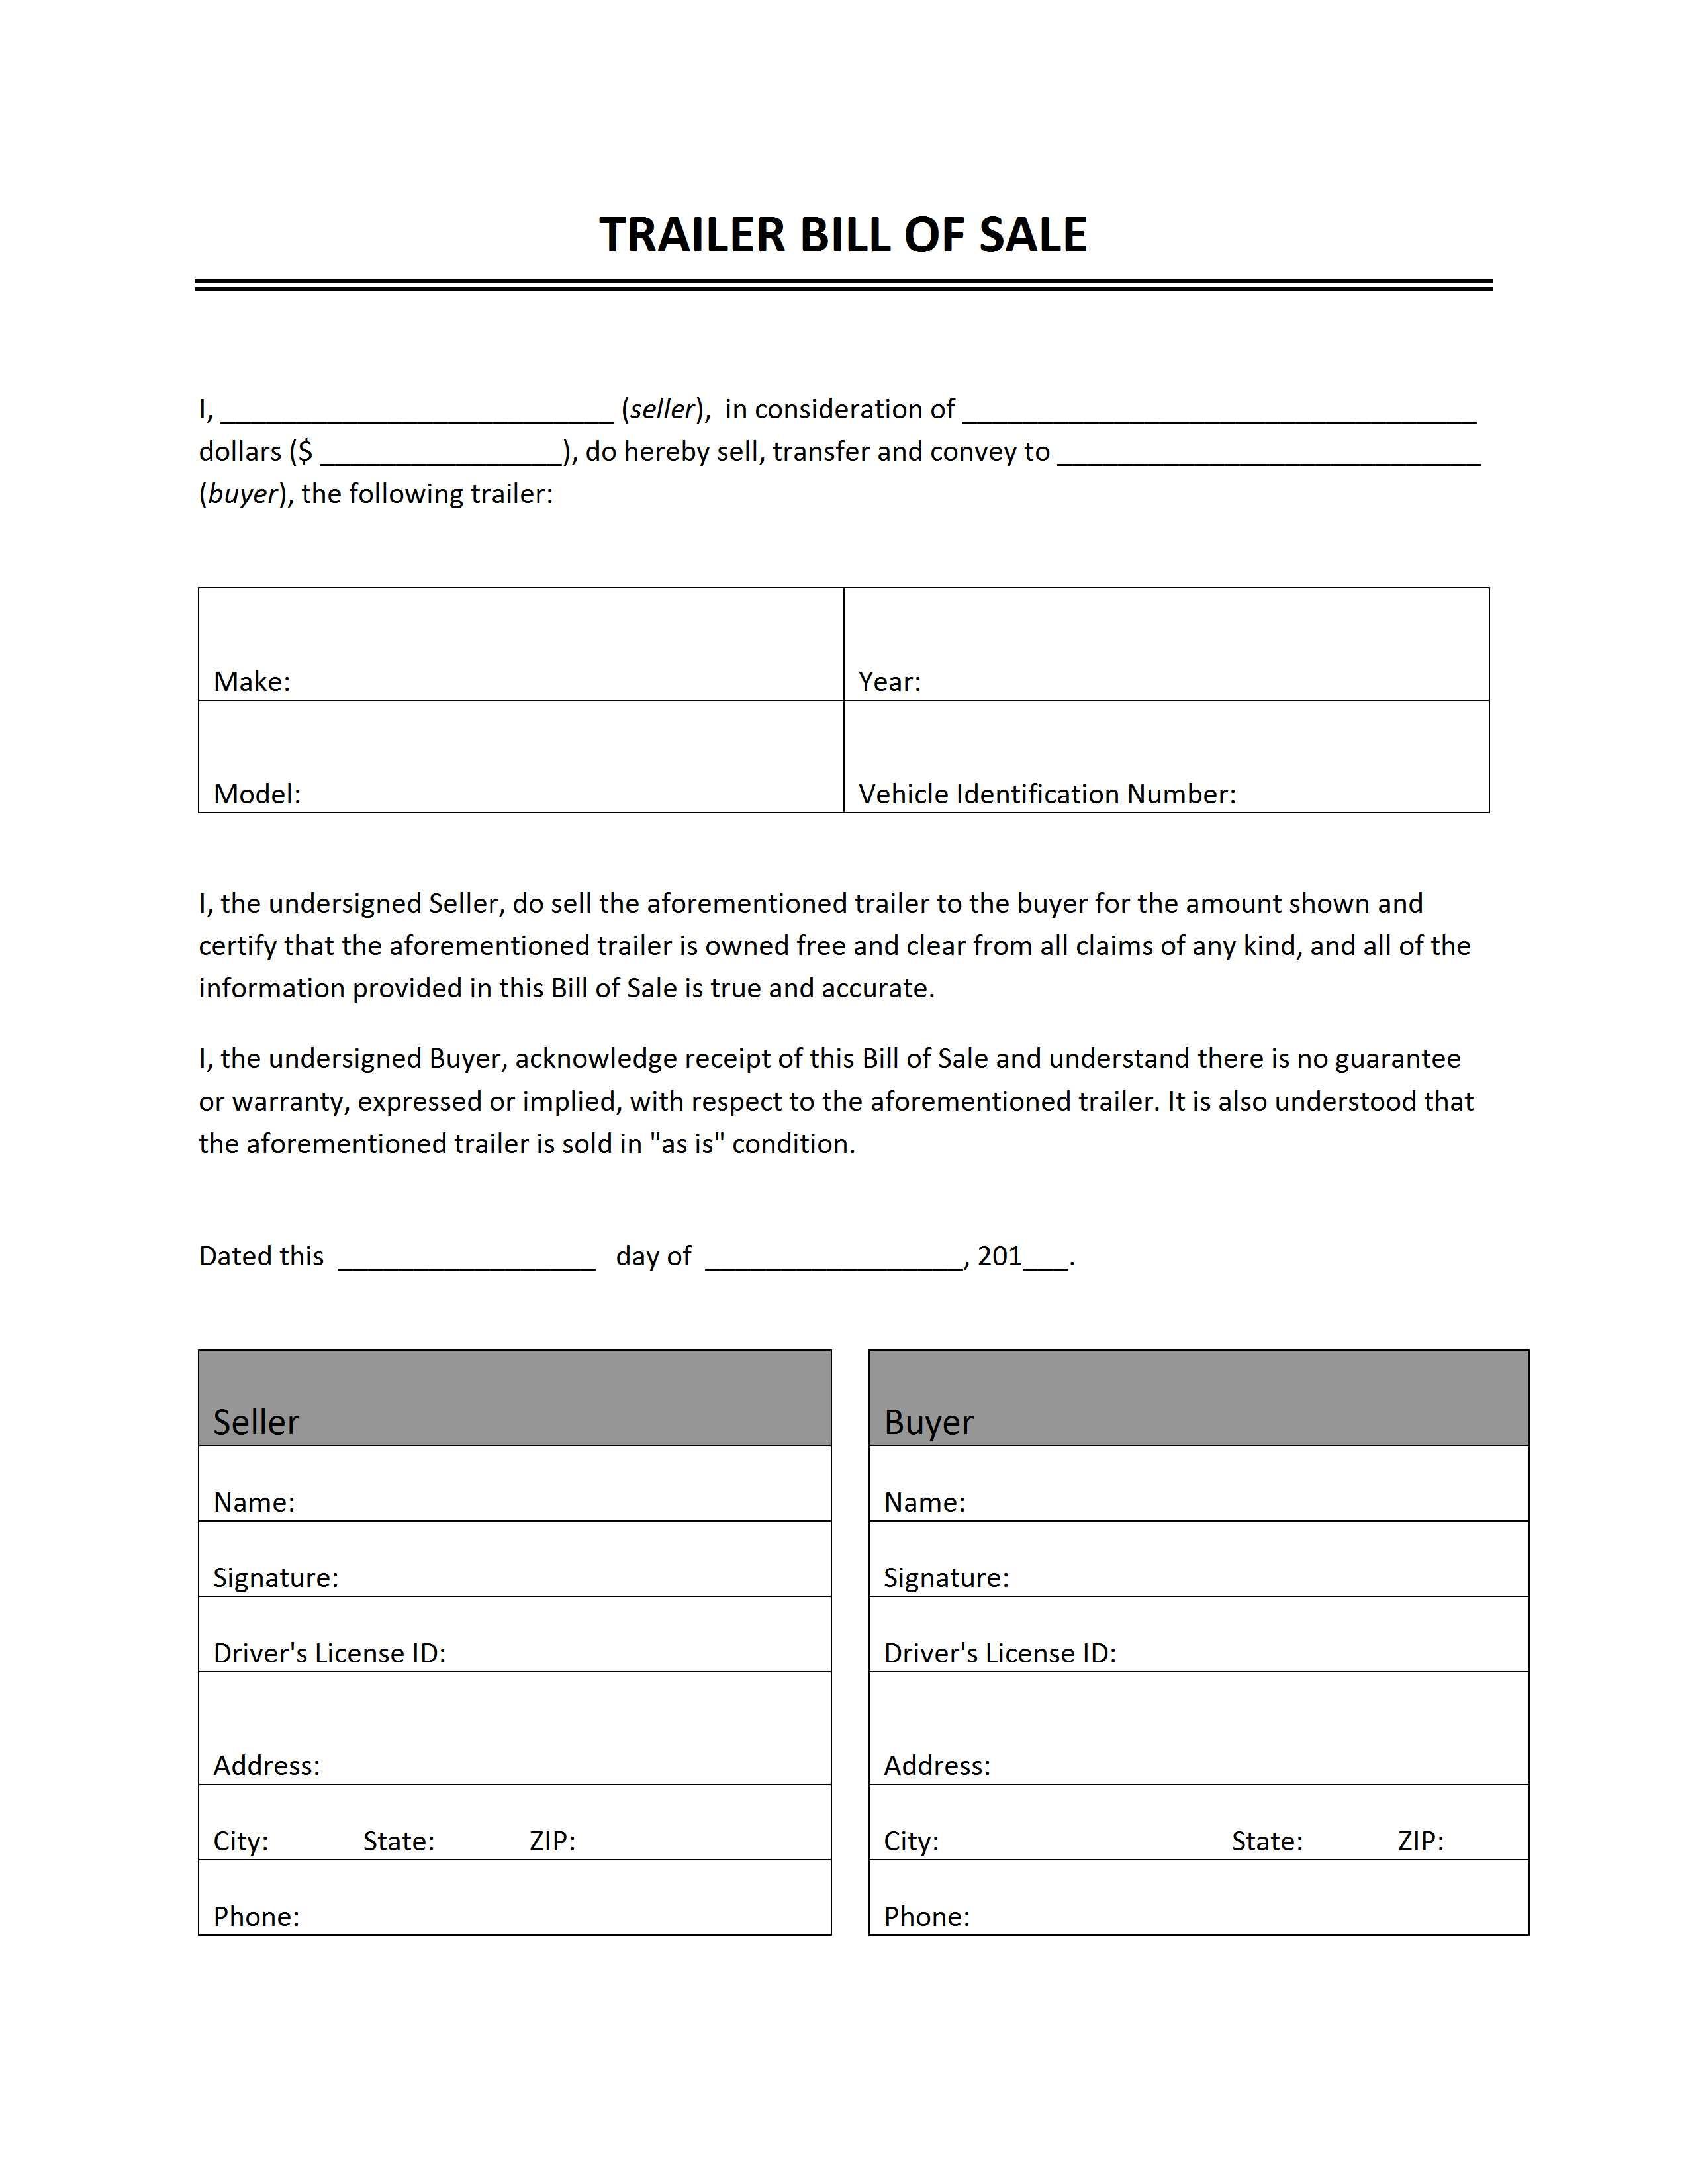 Free Printable Bill Of Sale Camper Form (Generic) - Free Printable Bill Of Sale